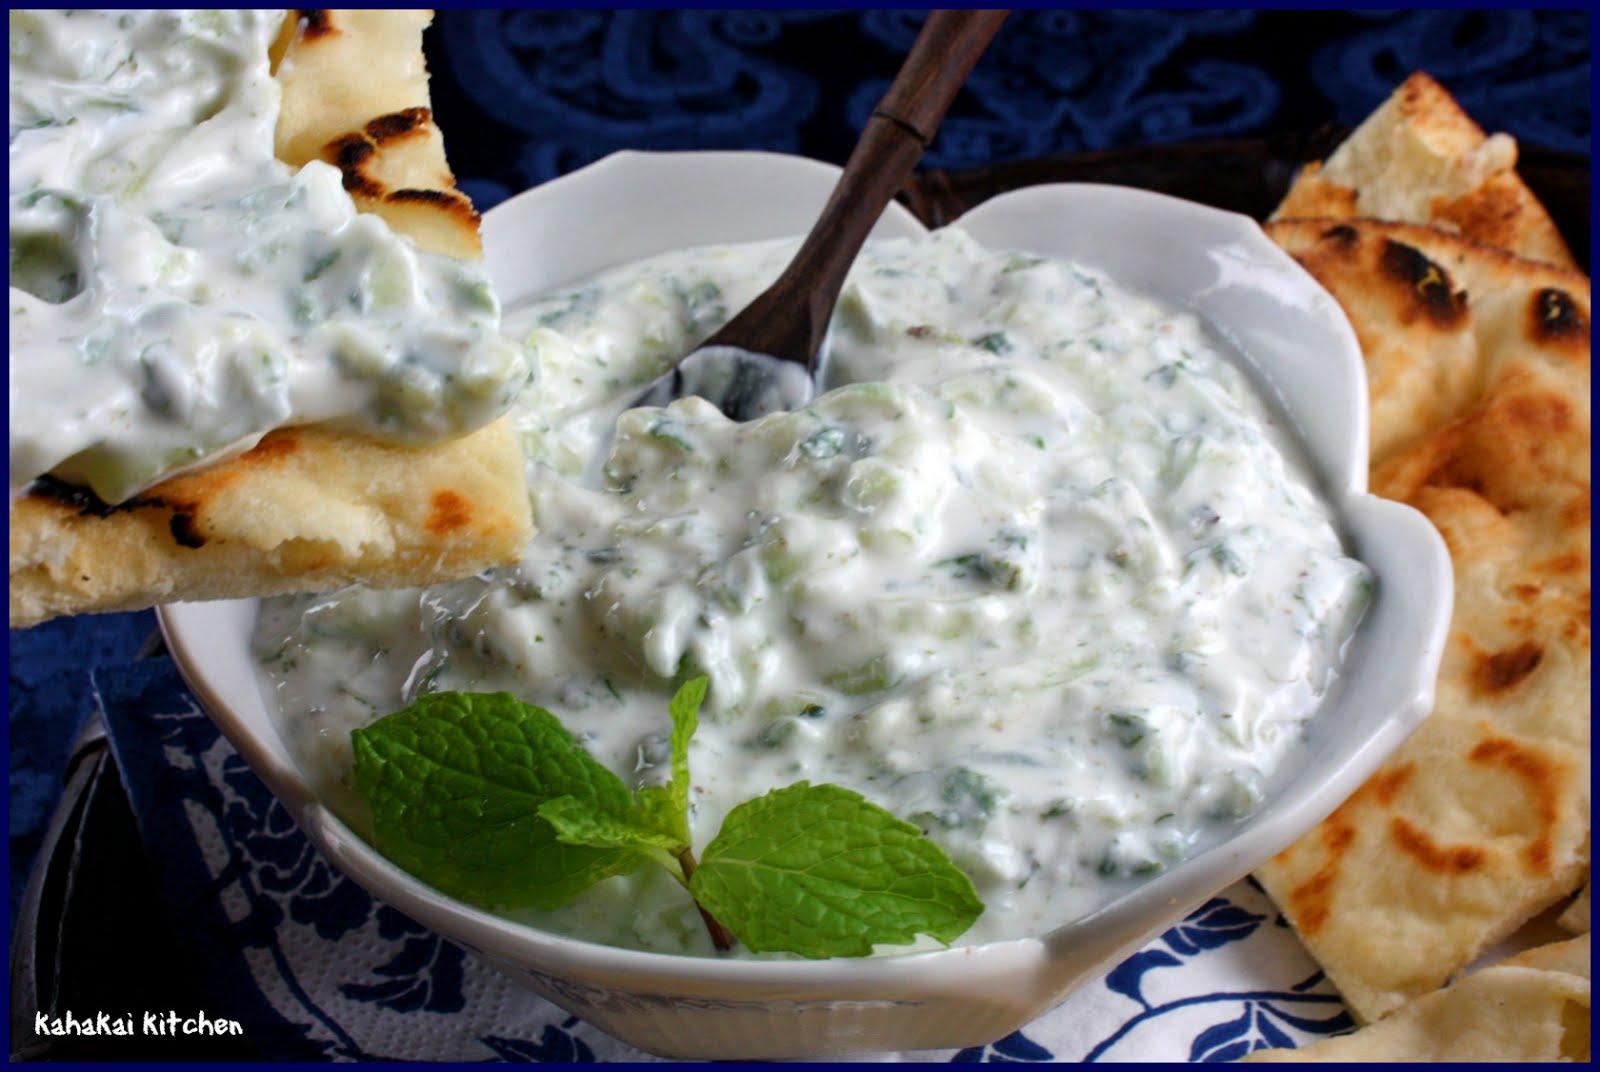 Kahakai Kitchen: Yogurt with Cucumber and Mint (Kheere ka Raita)